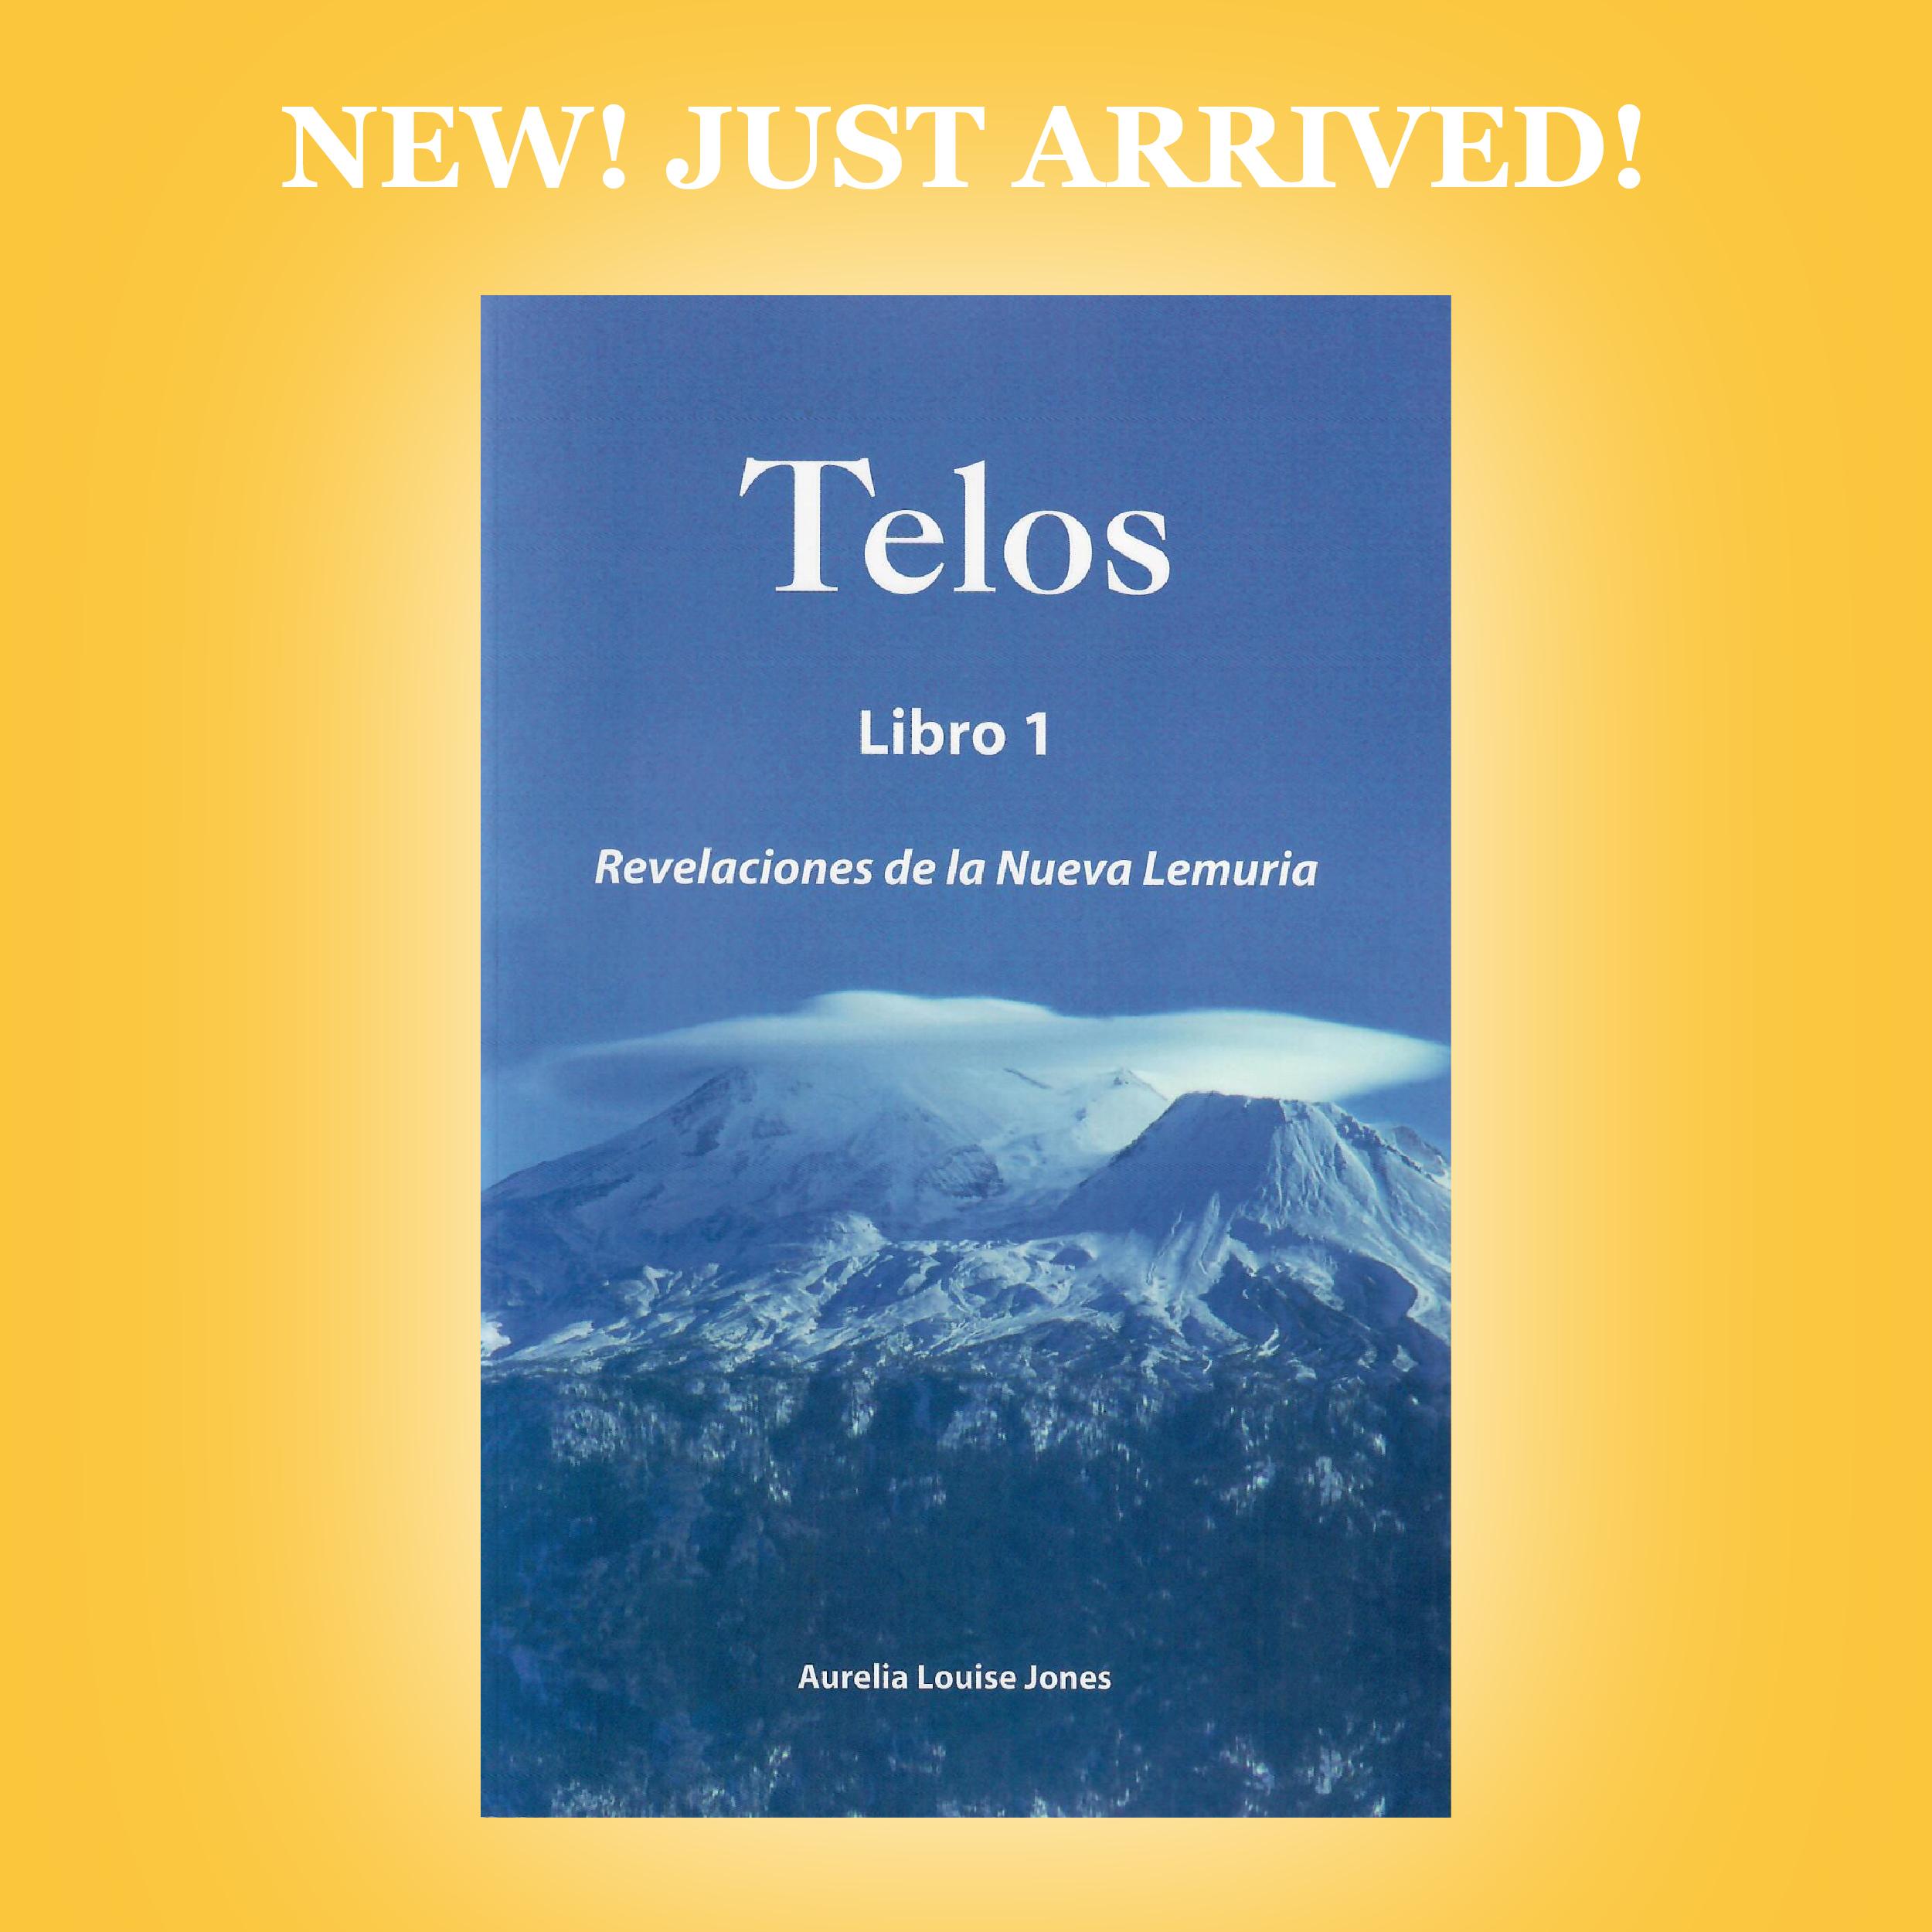 telos-libro-1-yellow-01.jpg